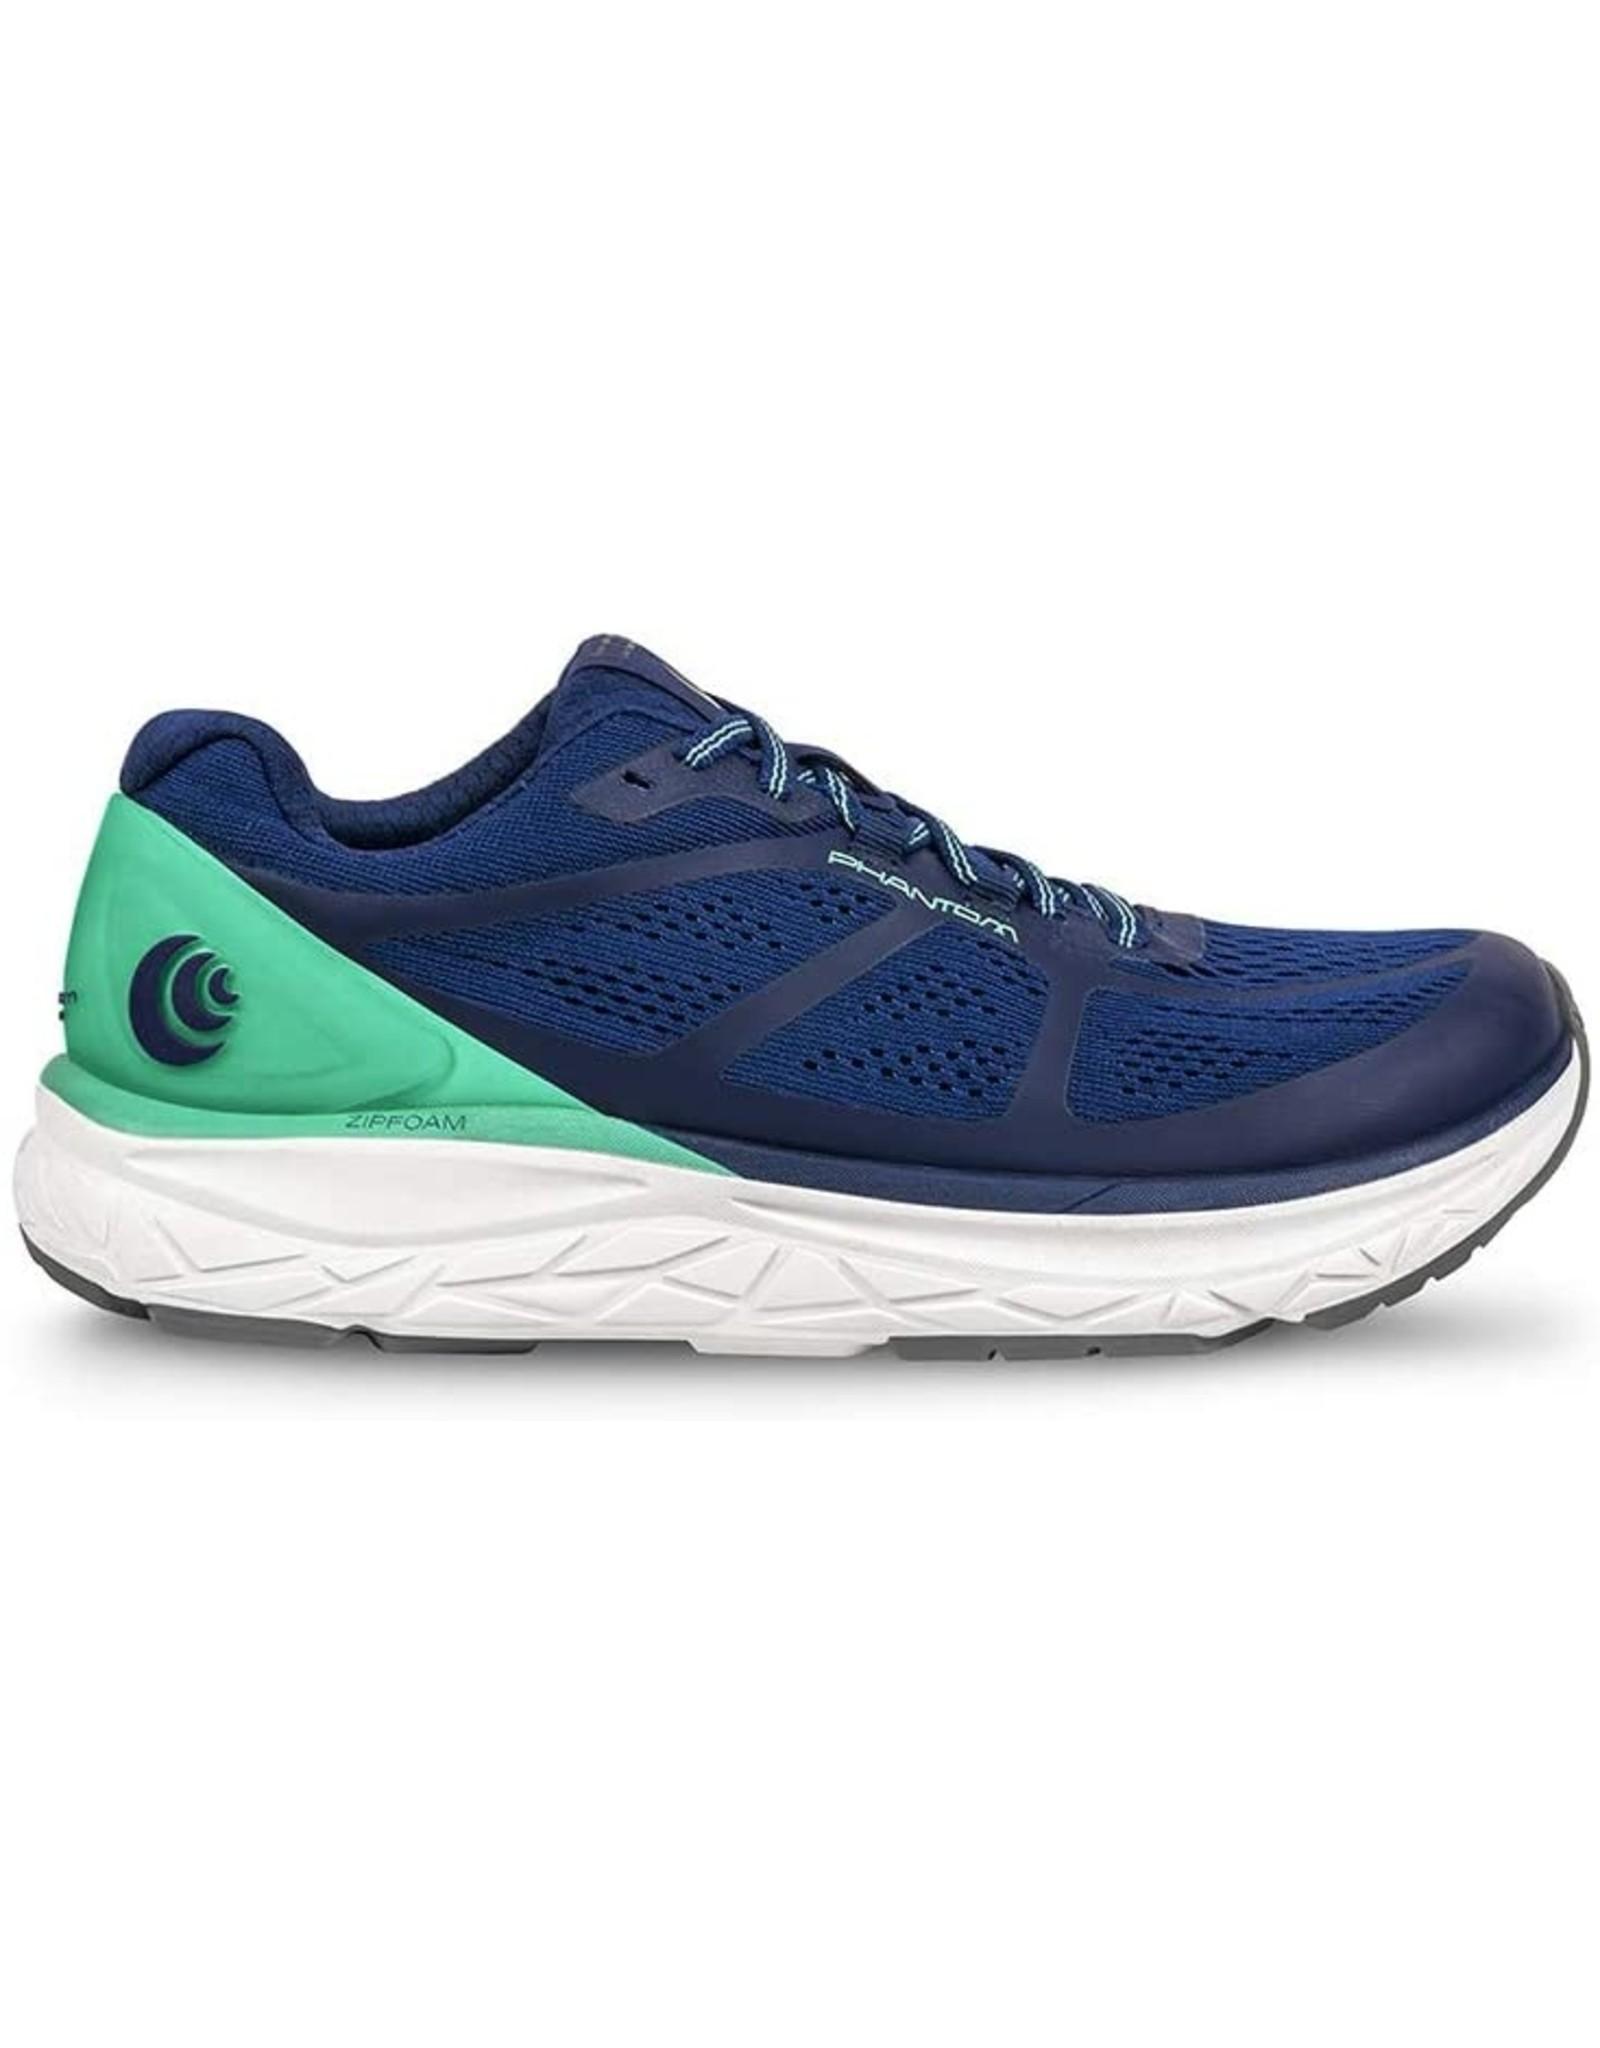 Topo Athletic Topo Athletic Phantom Women's Road Running Shoe Cobalt / Seafoam Size 9